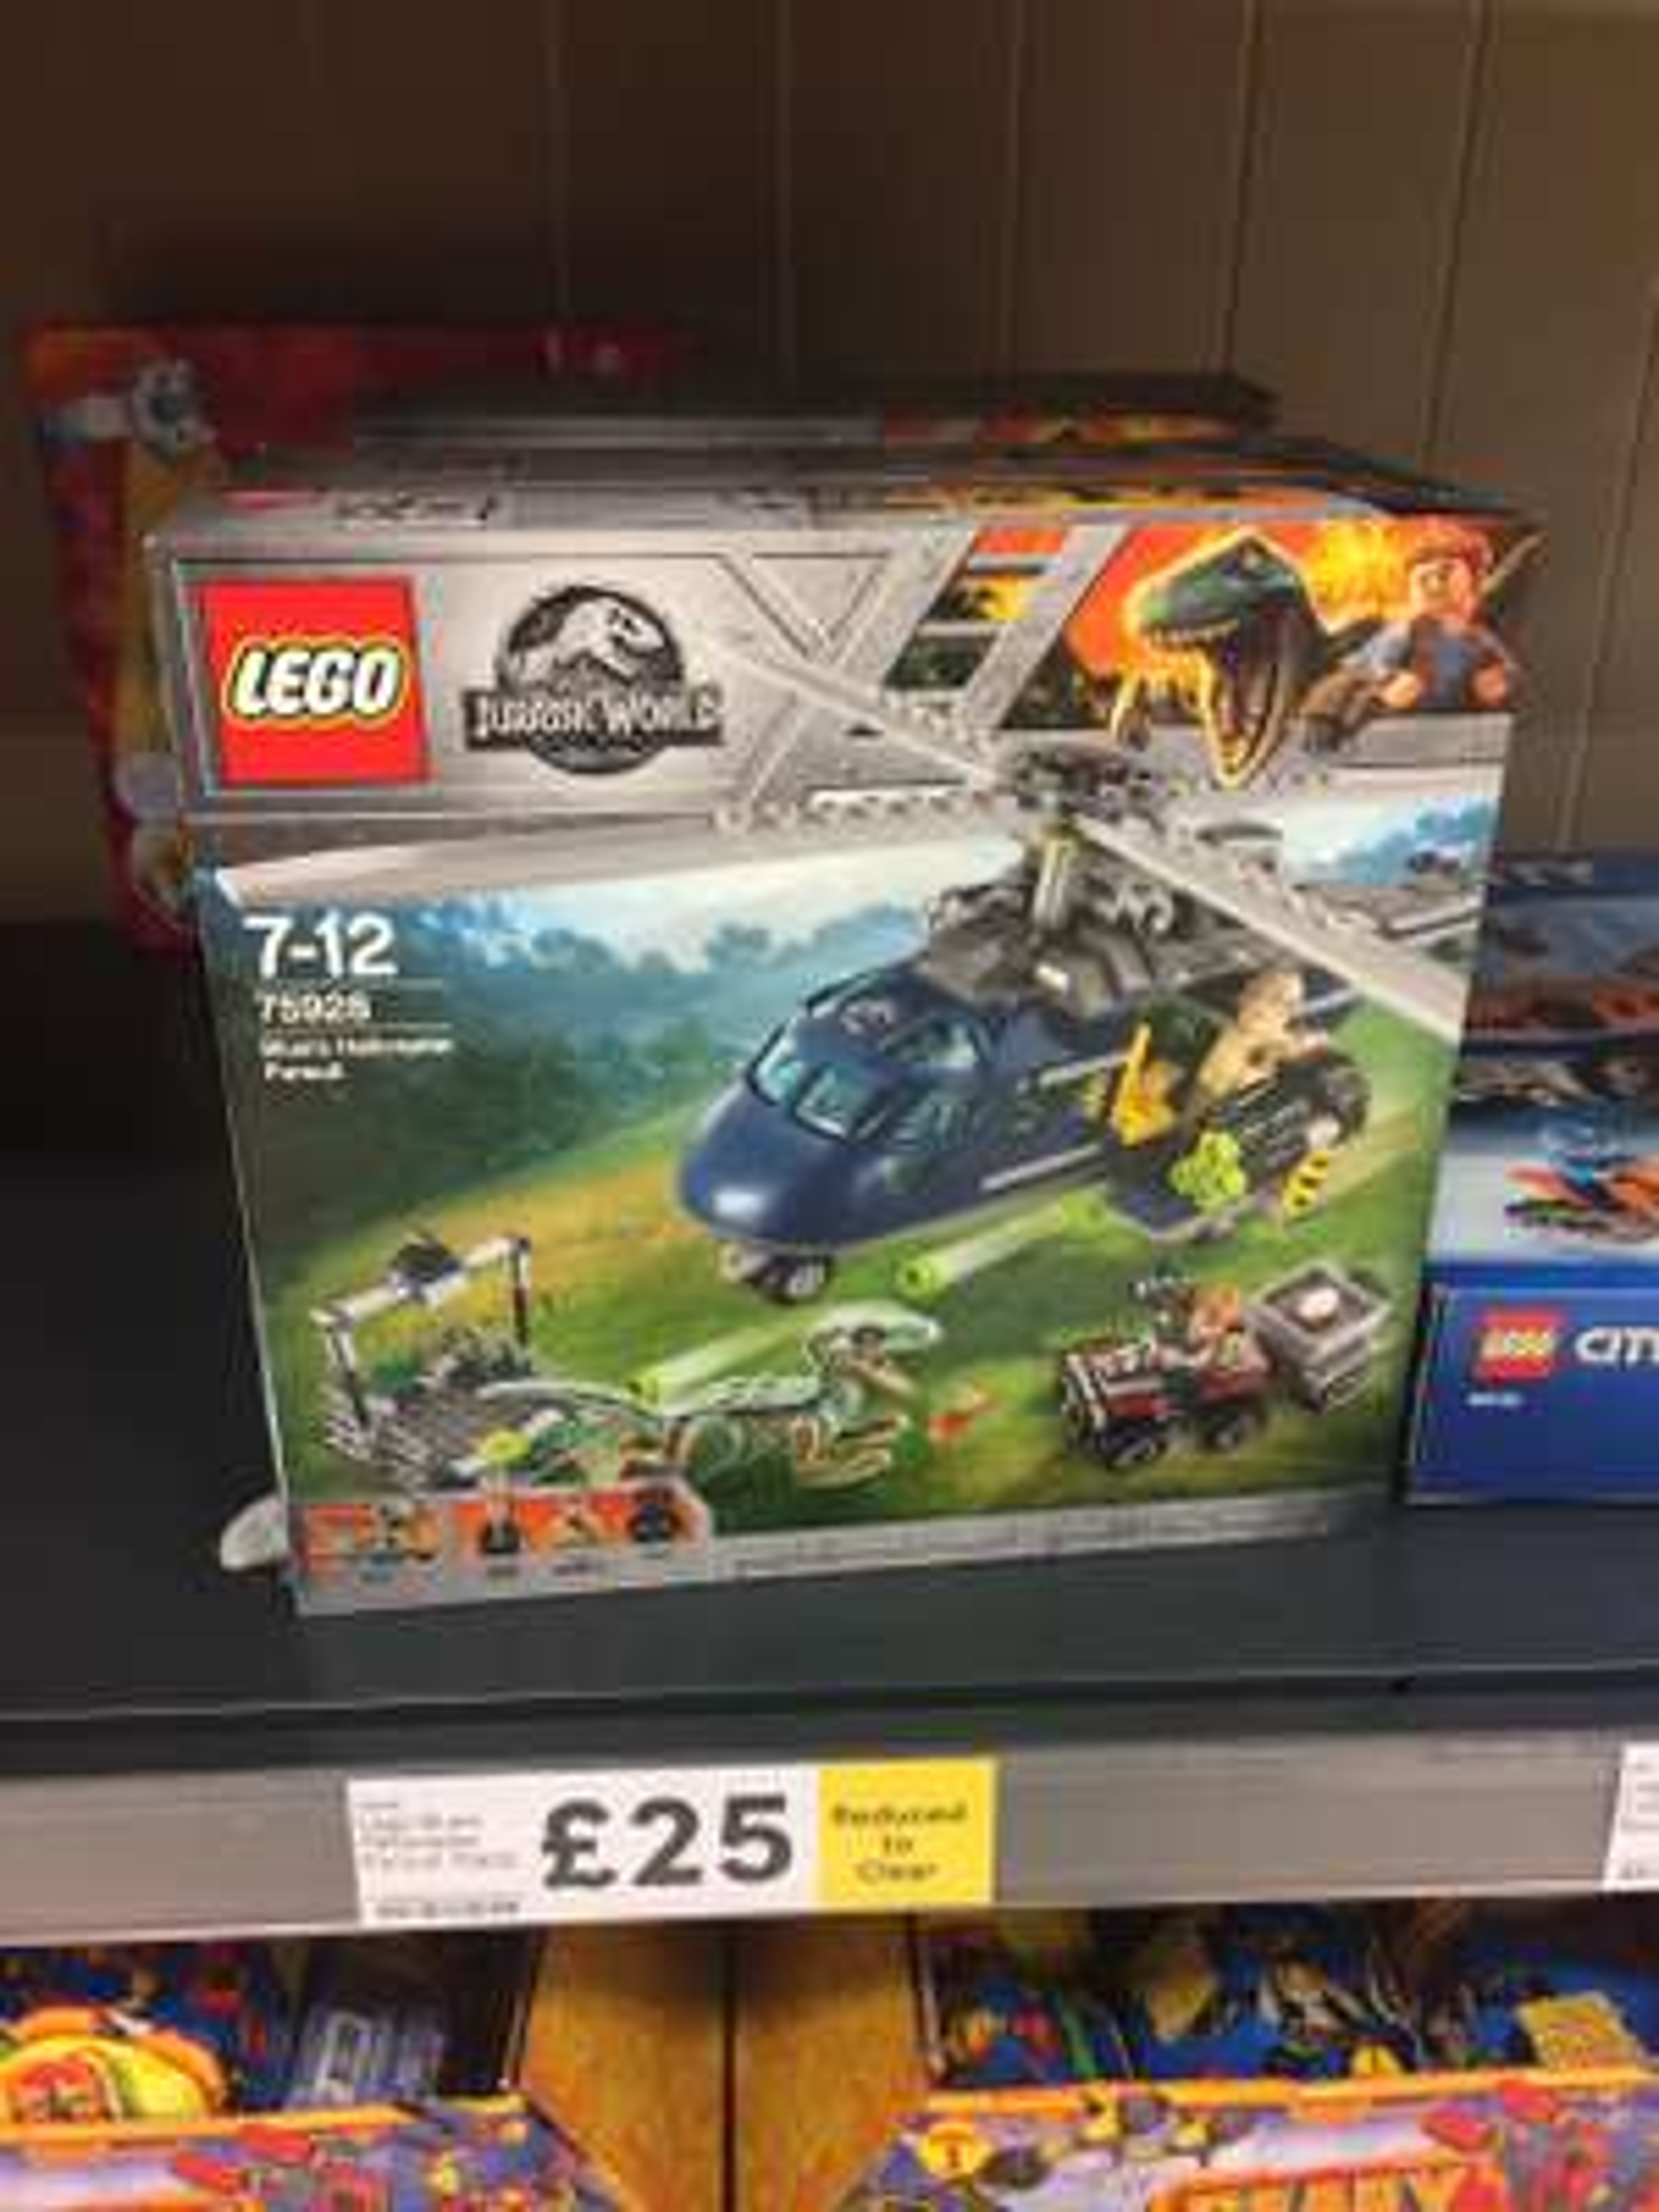 Lego 75928 Jurassic World Blue's Helicopter Pursuit - £25 instore @ Tesco